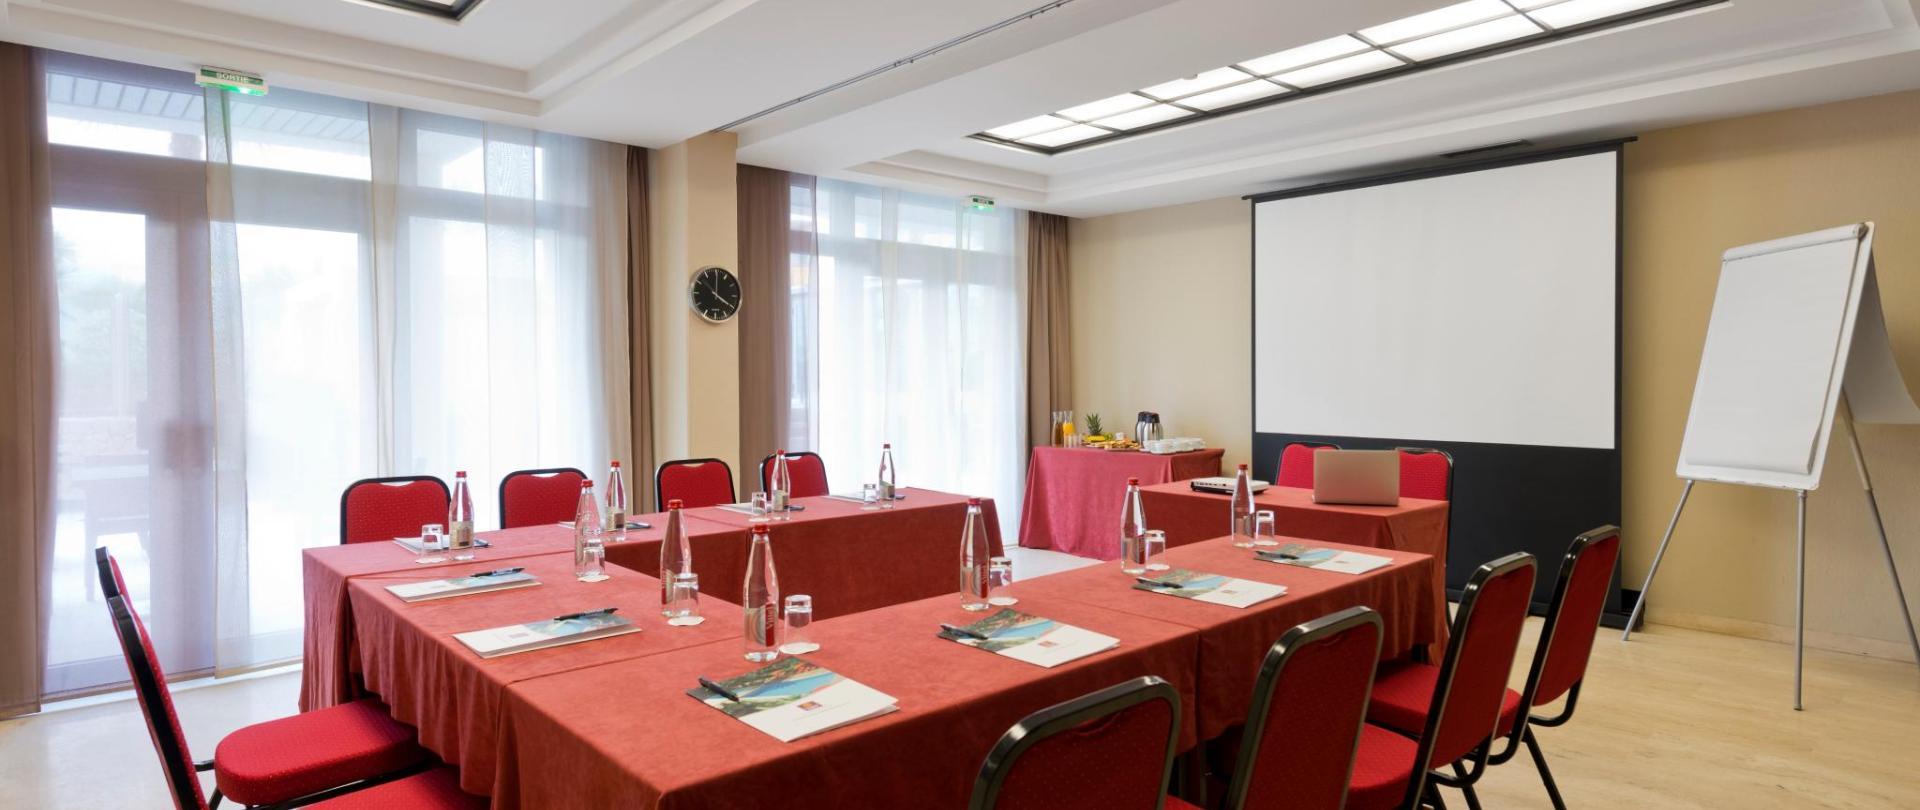 Seminaires Clarion Suites Cannes Croisette